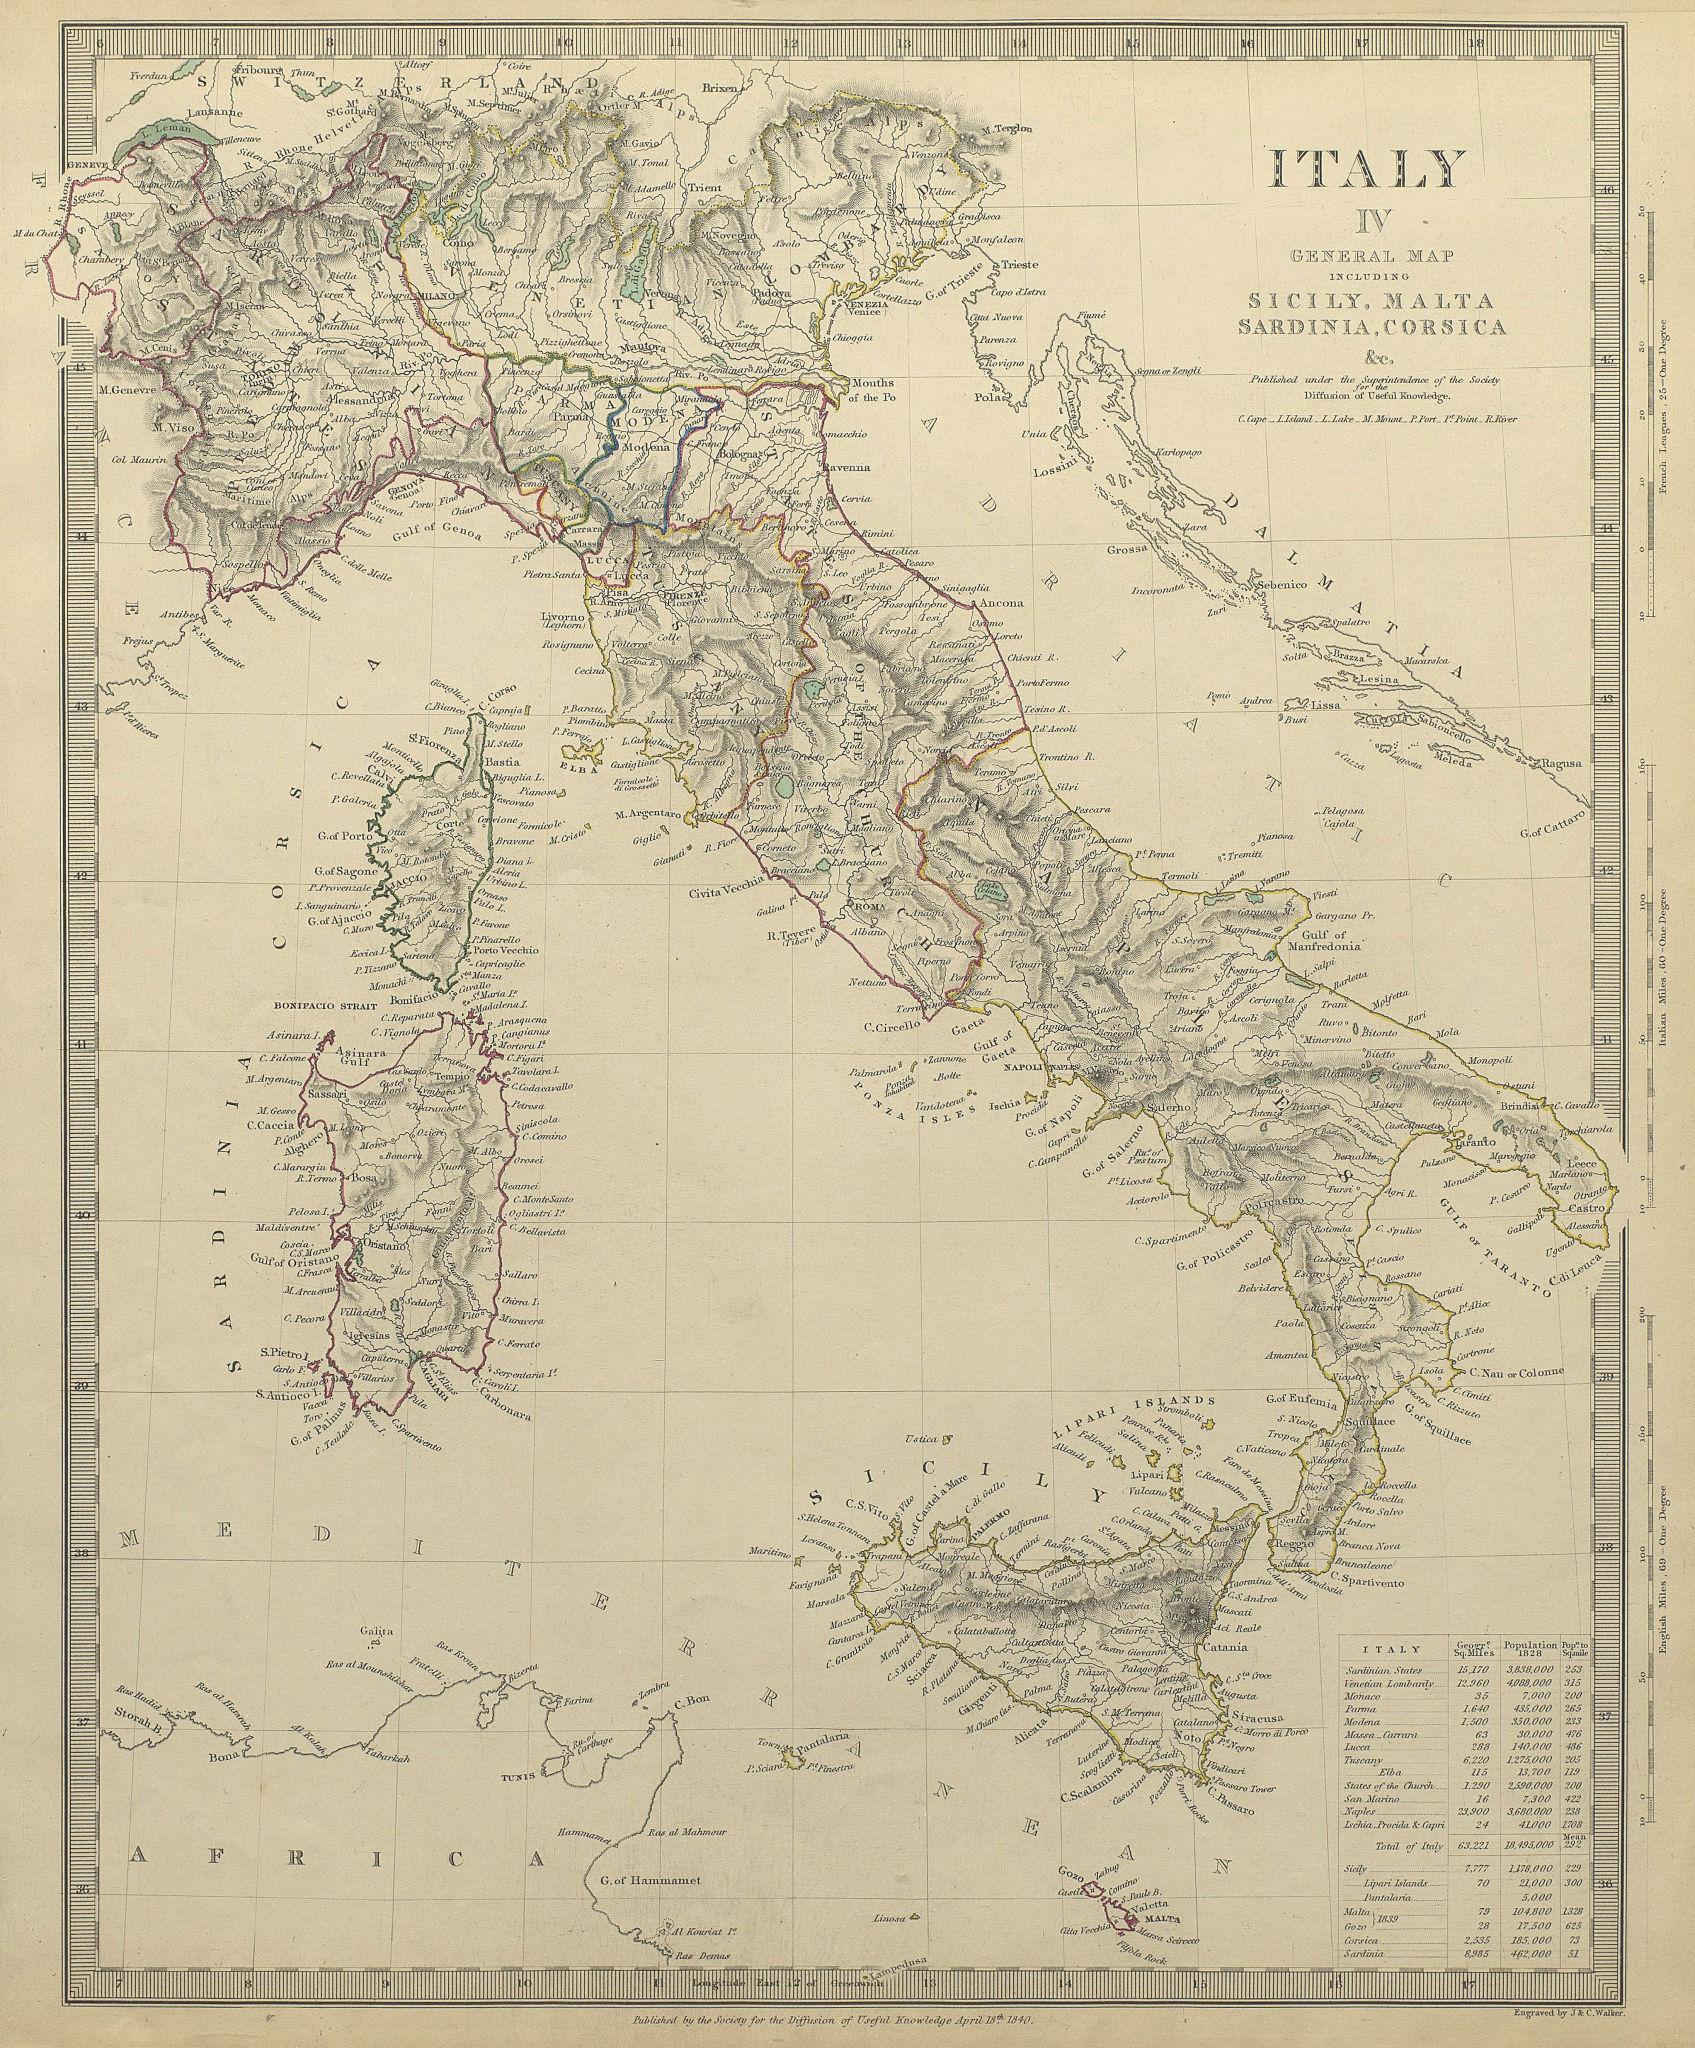 ITALY General Map Sicily Sardinia Corsica Malta. Population table SDUK 1844